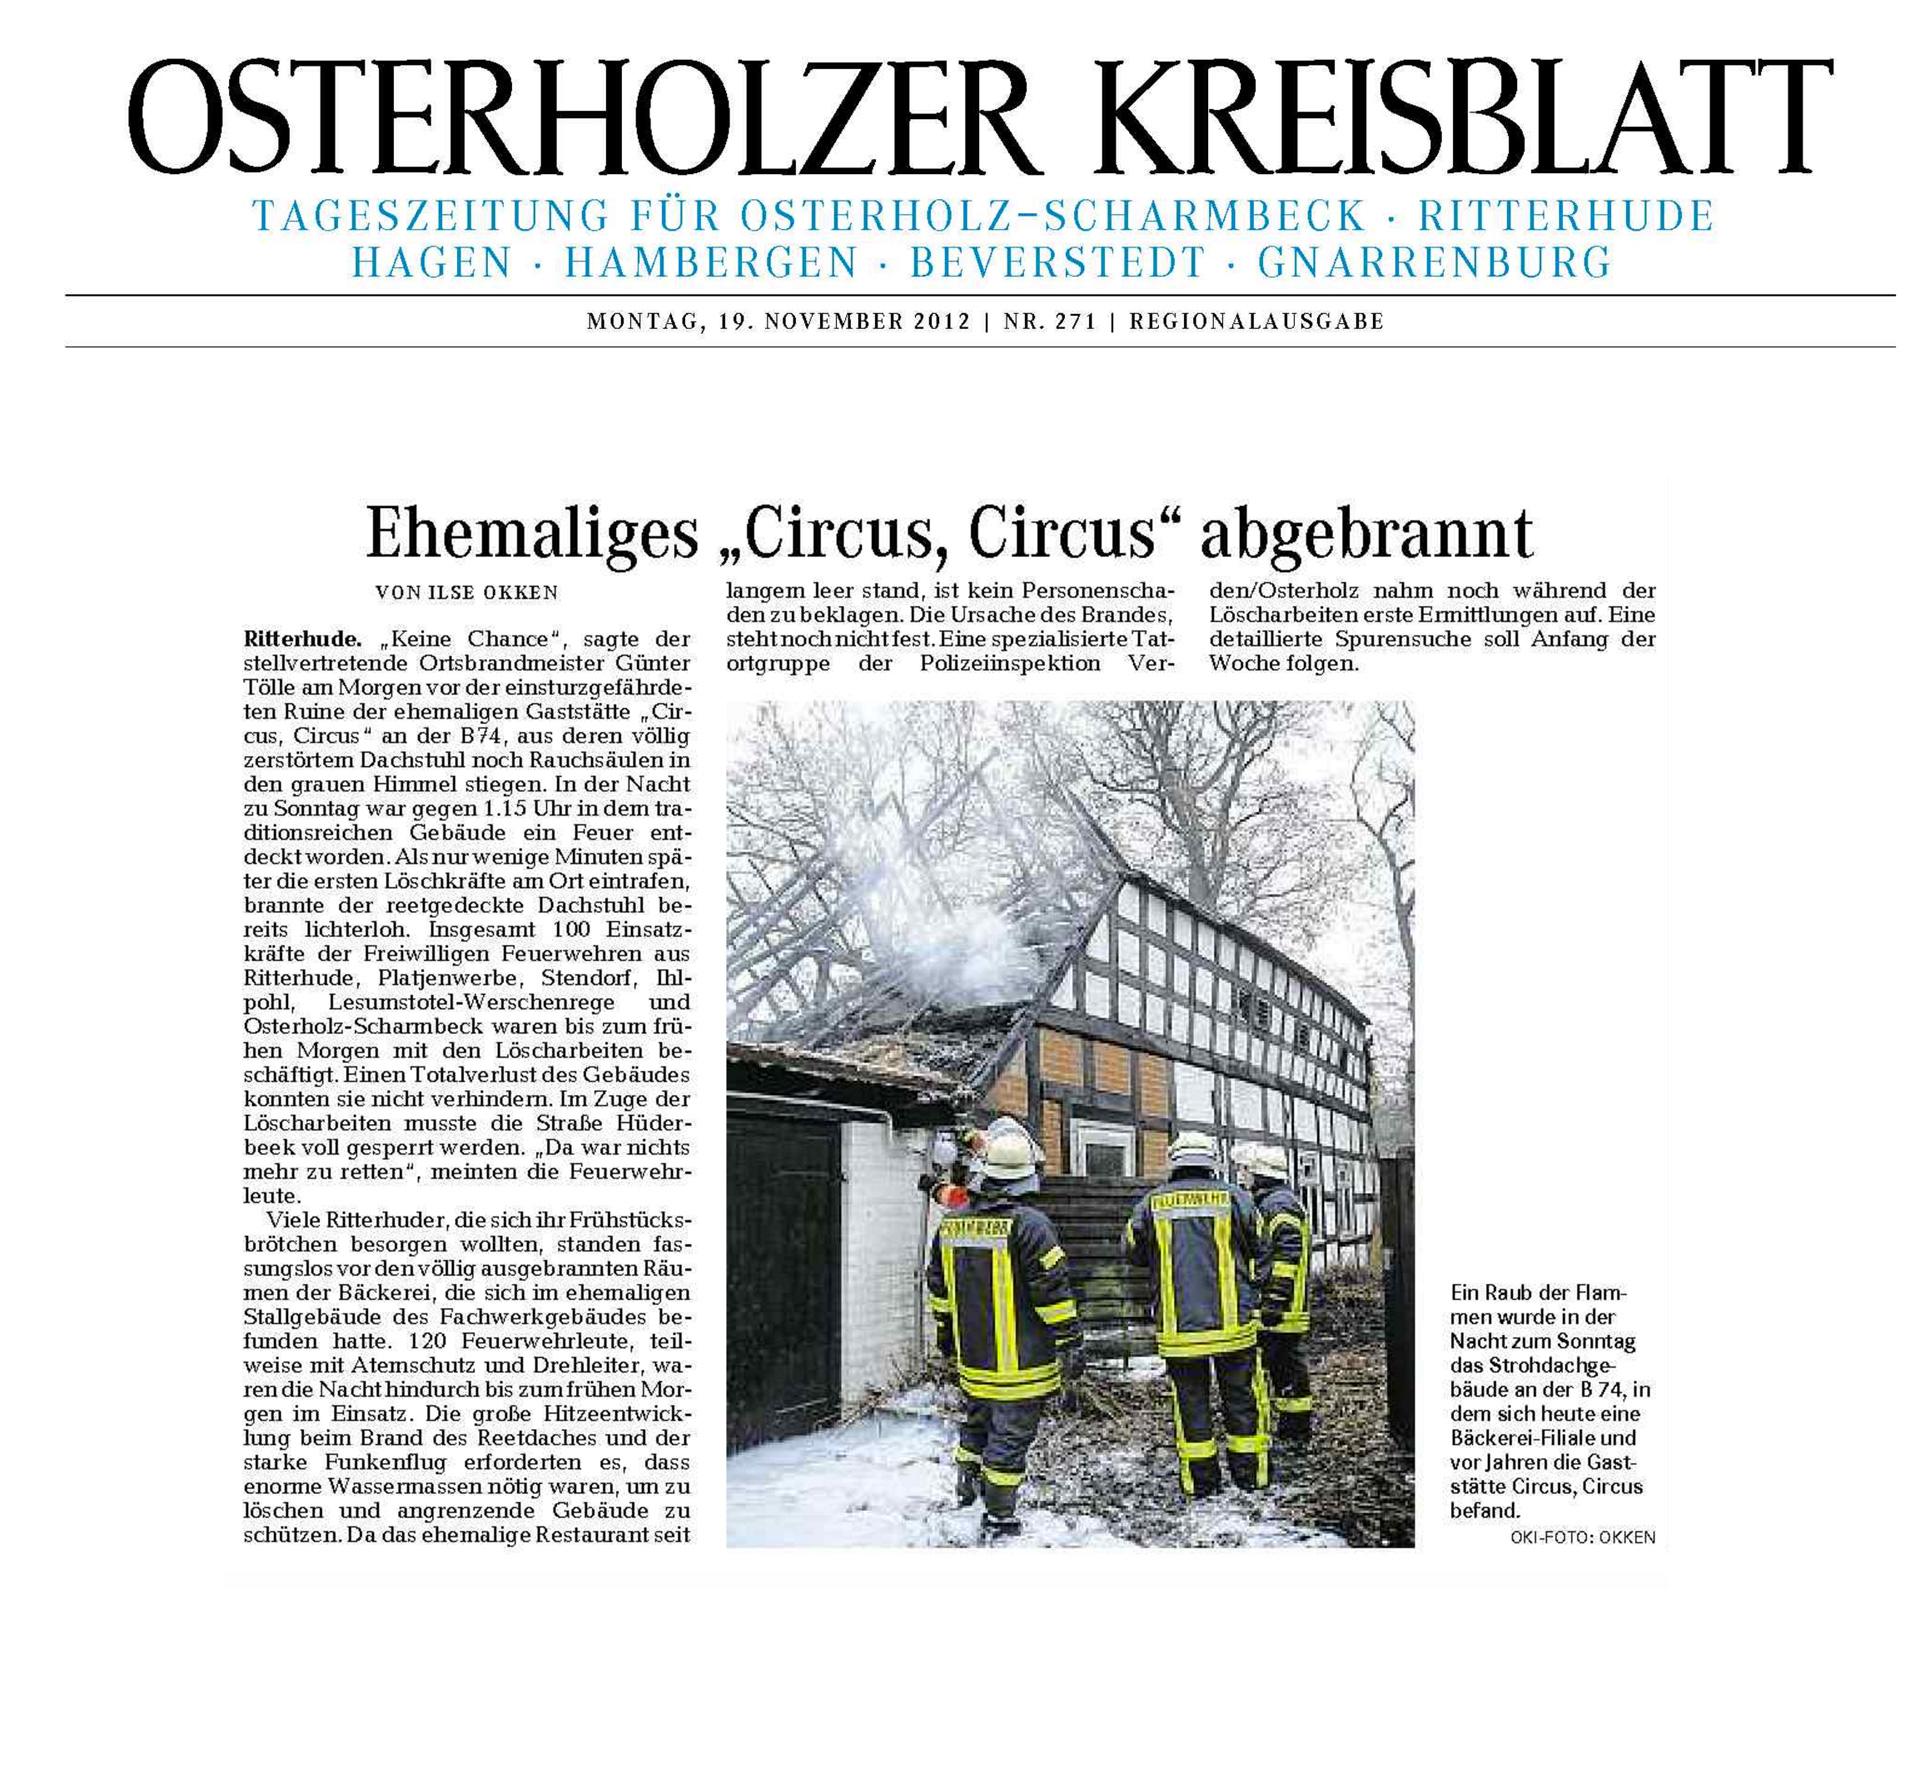 Osterholzer Kreisblatt Circus Circus Großbrand